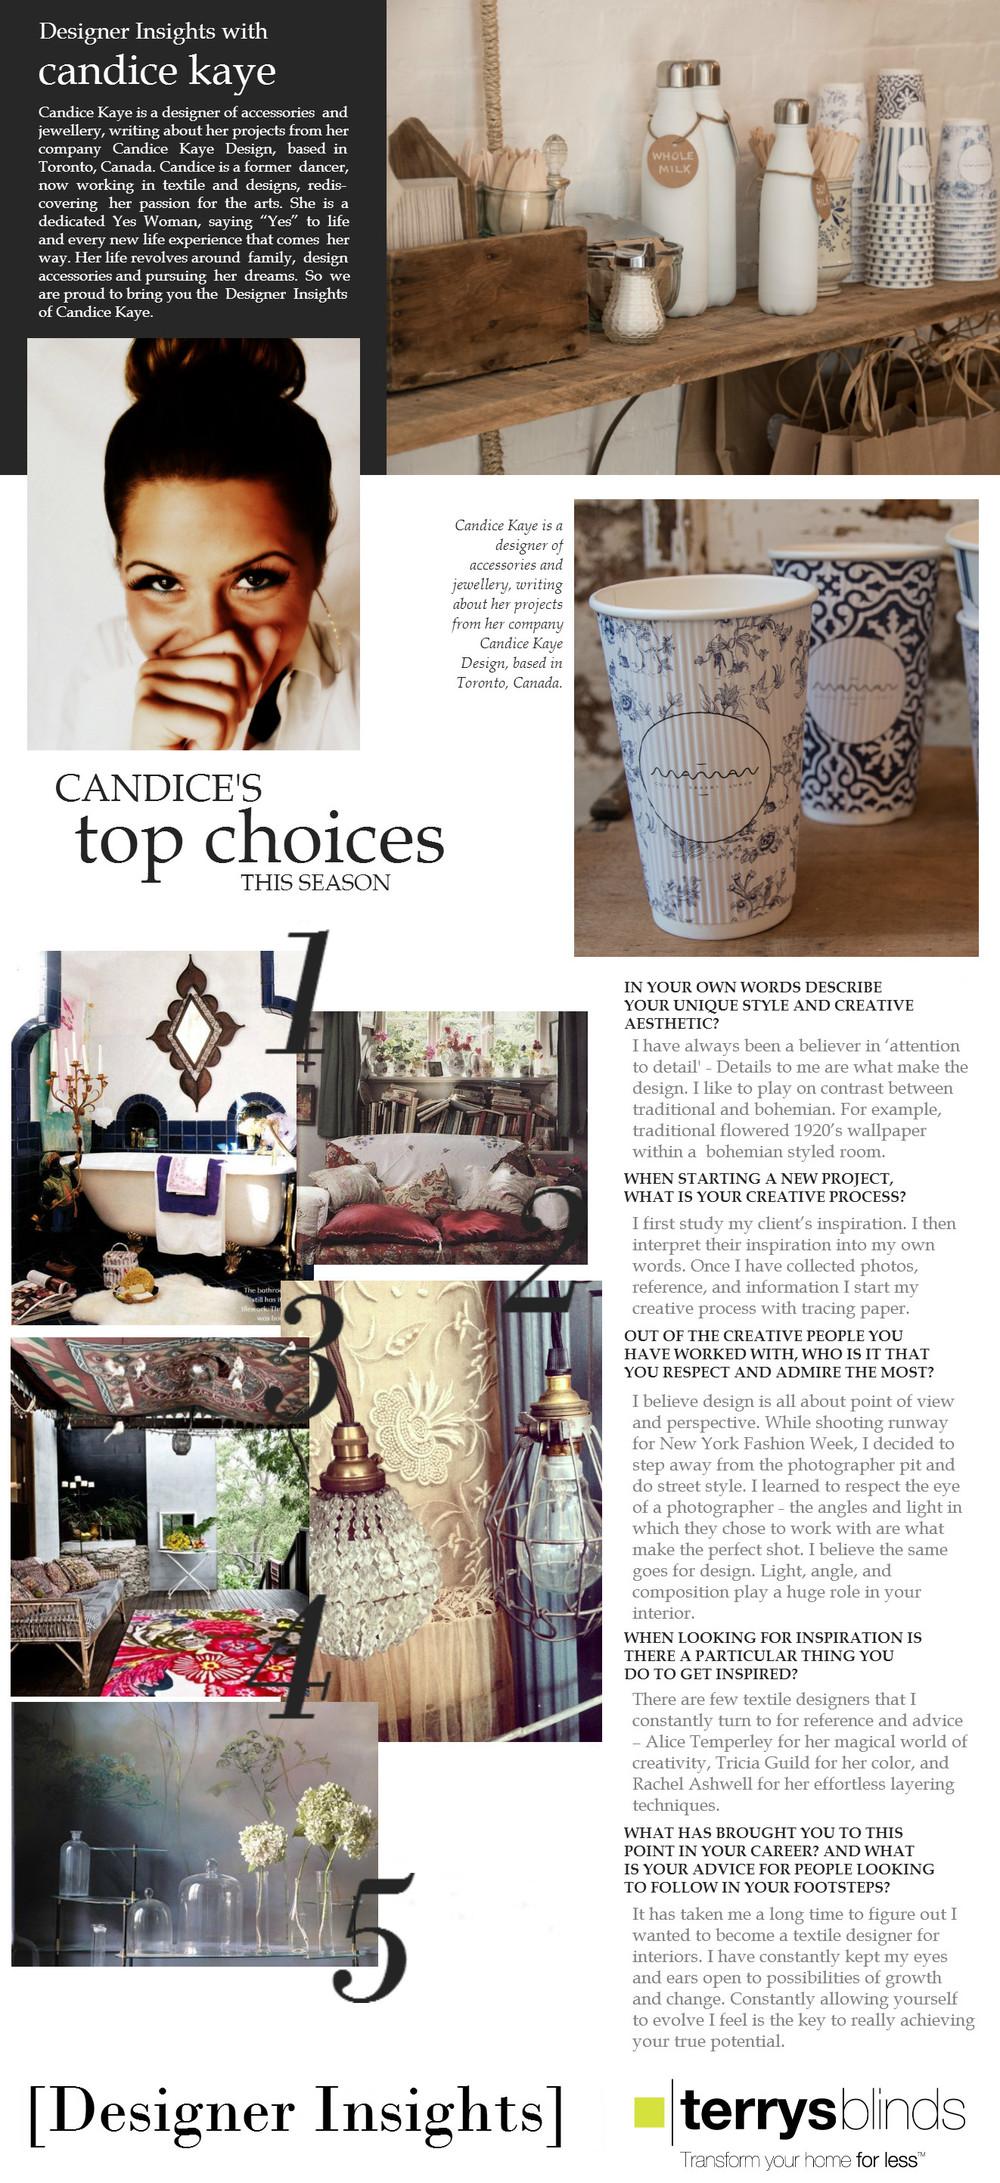 Designer-Insights-Candice-Kaye.jpg